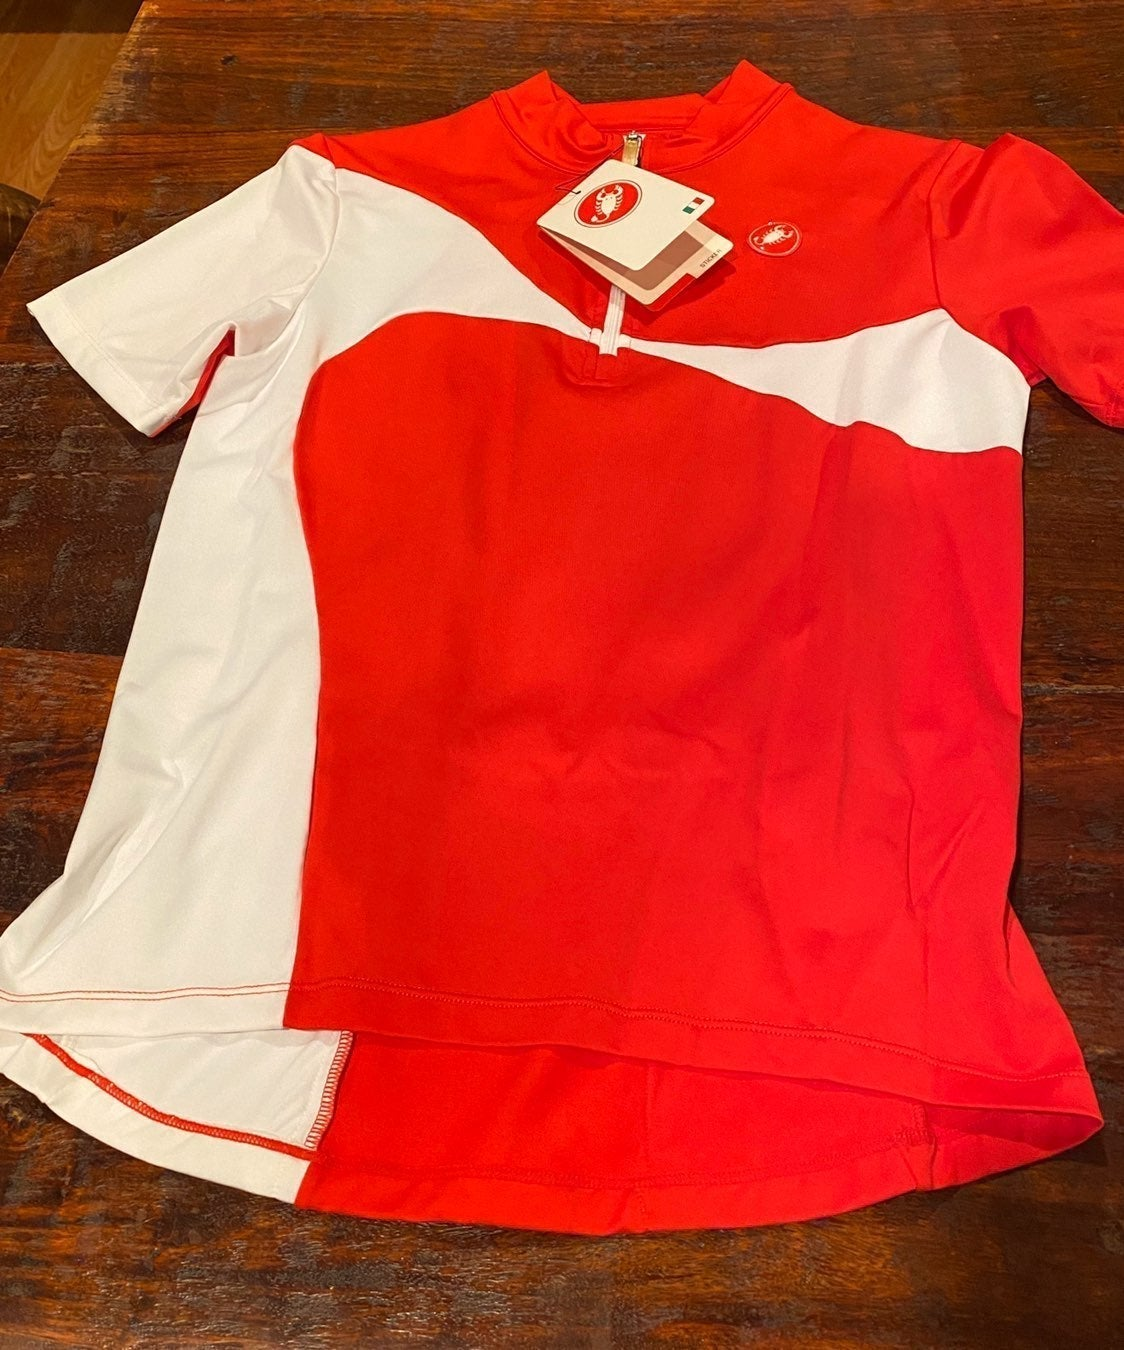 Castelli women's cycling jersey